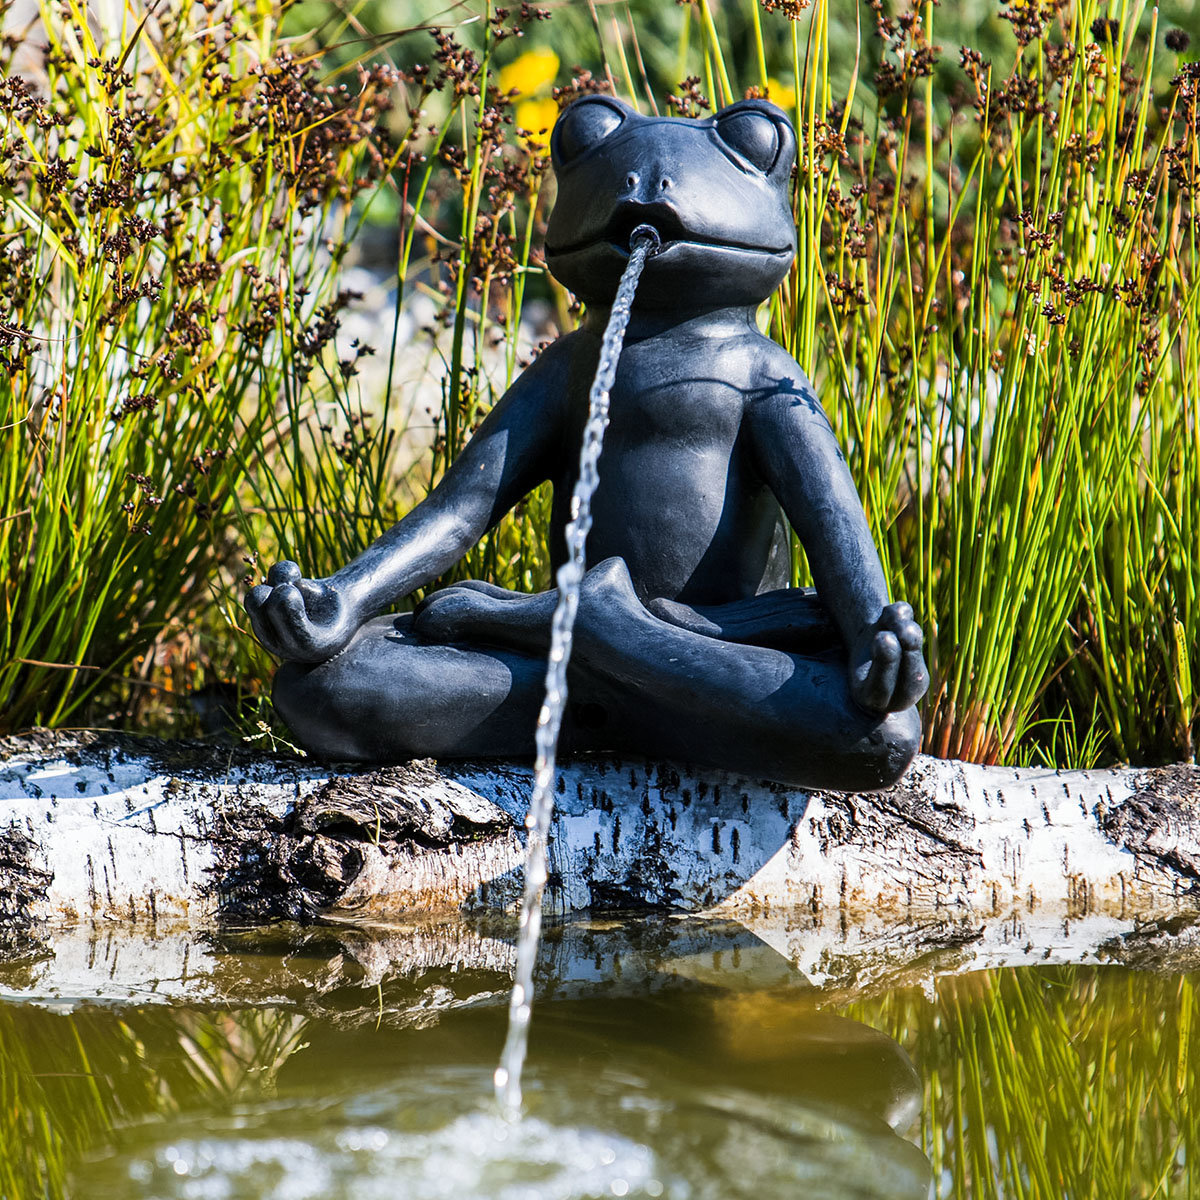 Wasserspiel Yoga-Frosch, 25x18x23cm